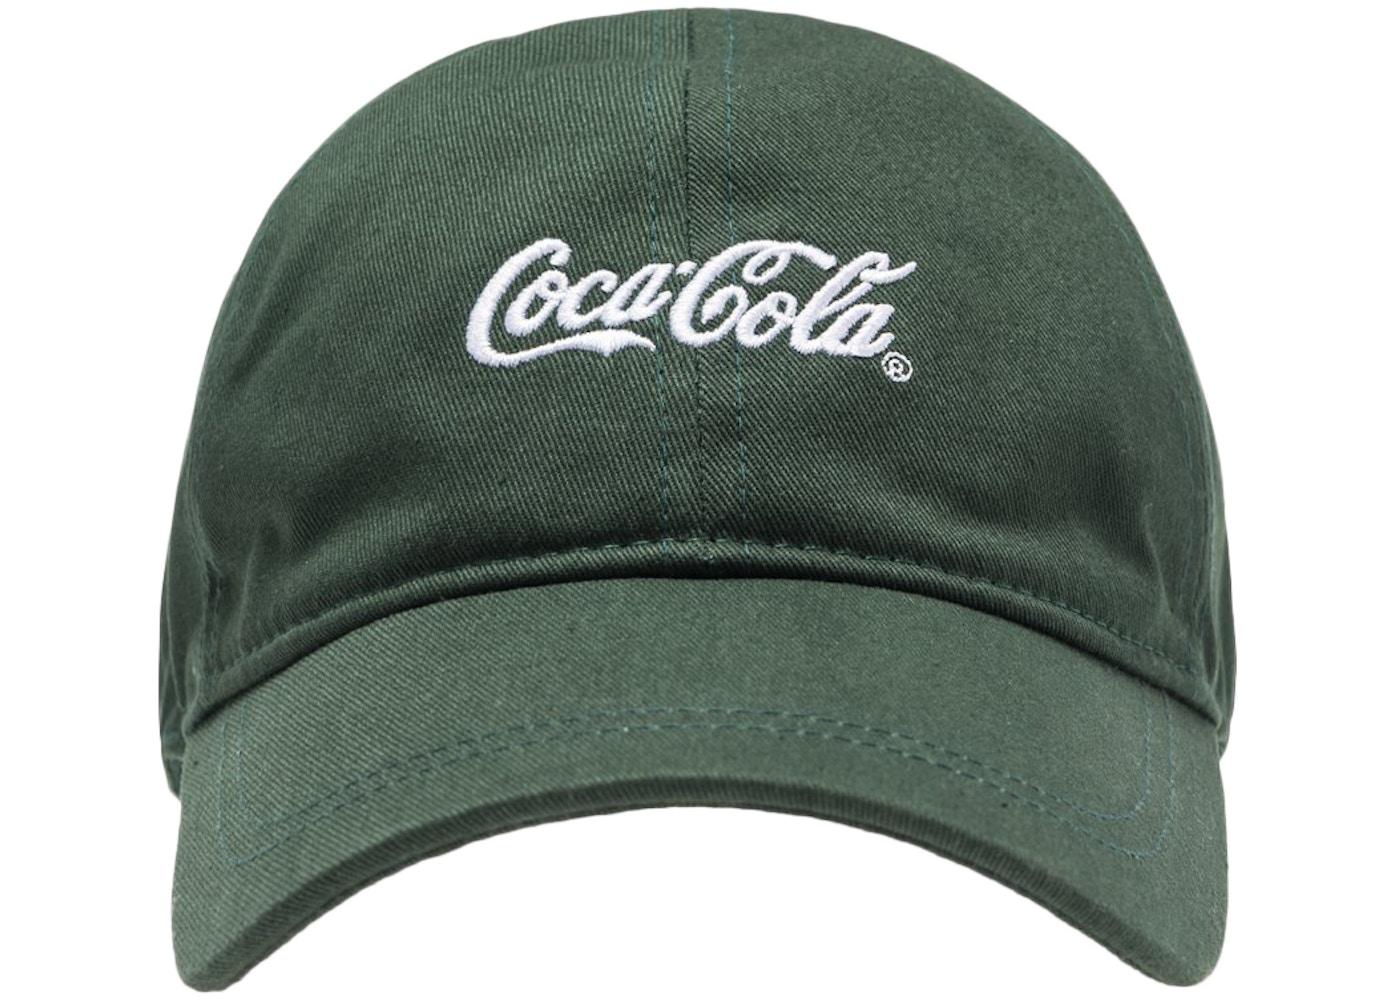 07019d83358 Kith x Coca-Cola Classic Coke Logo Cap Green • FW18 Release • StockX